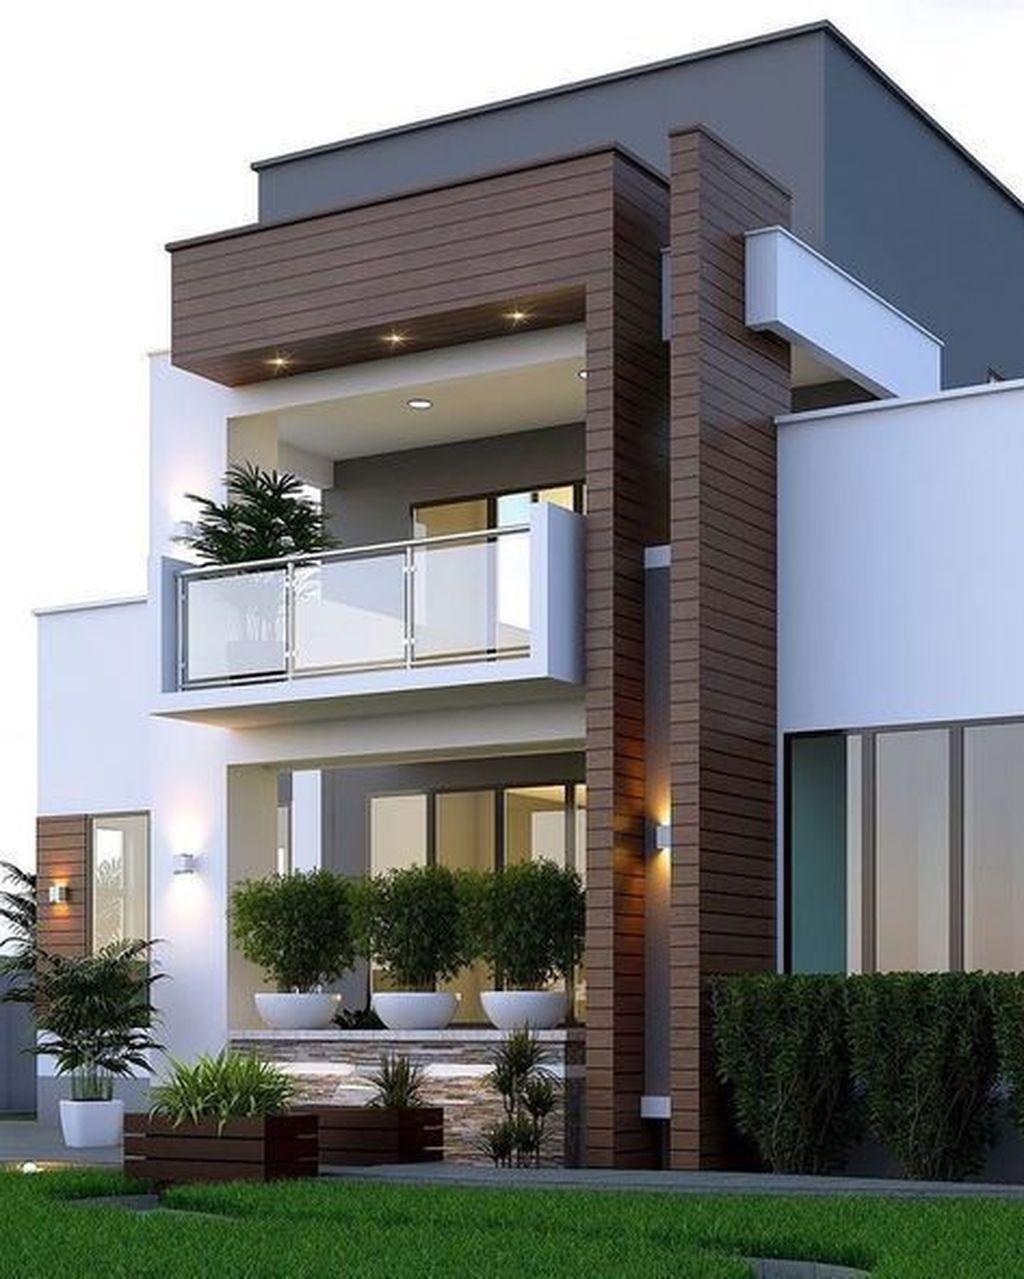 36 Amazing Modern Home Design Exterior Ideas Searchomee Modern